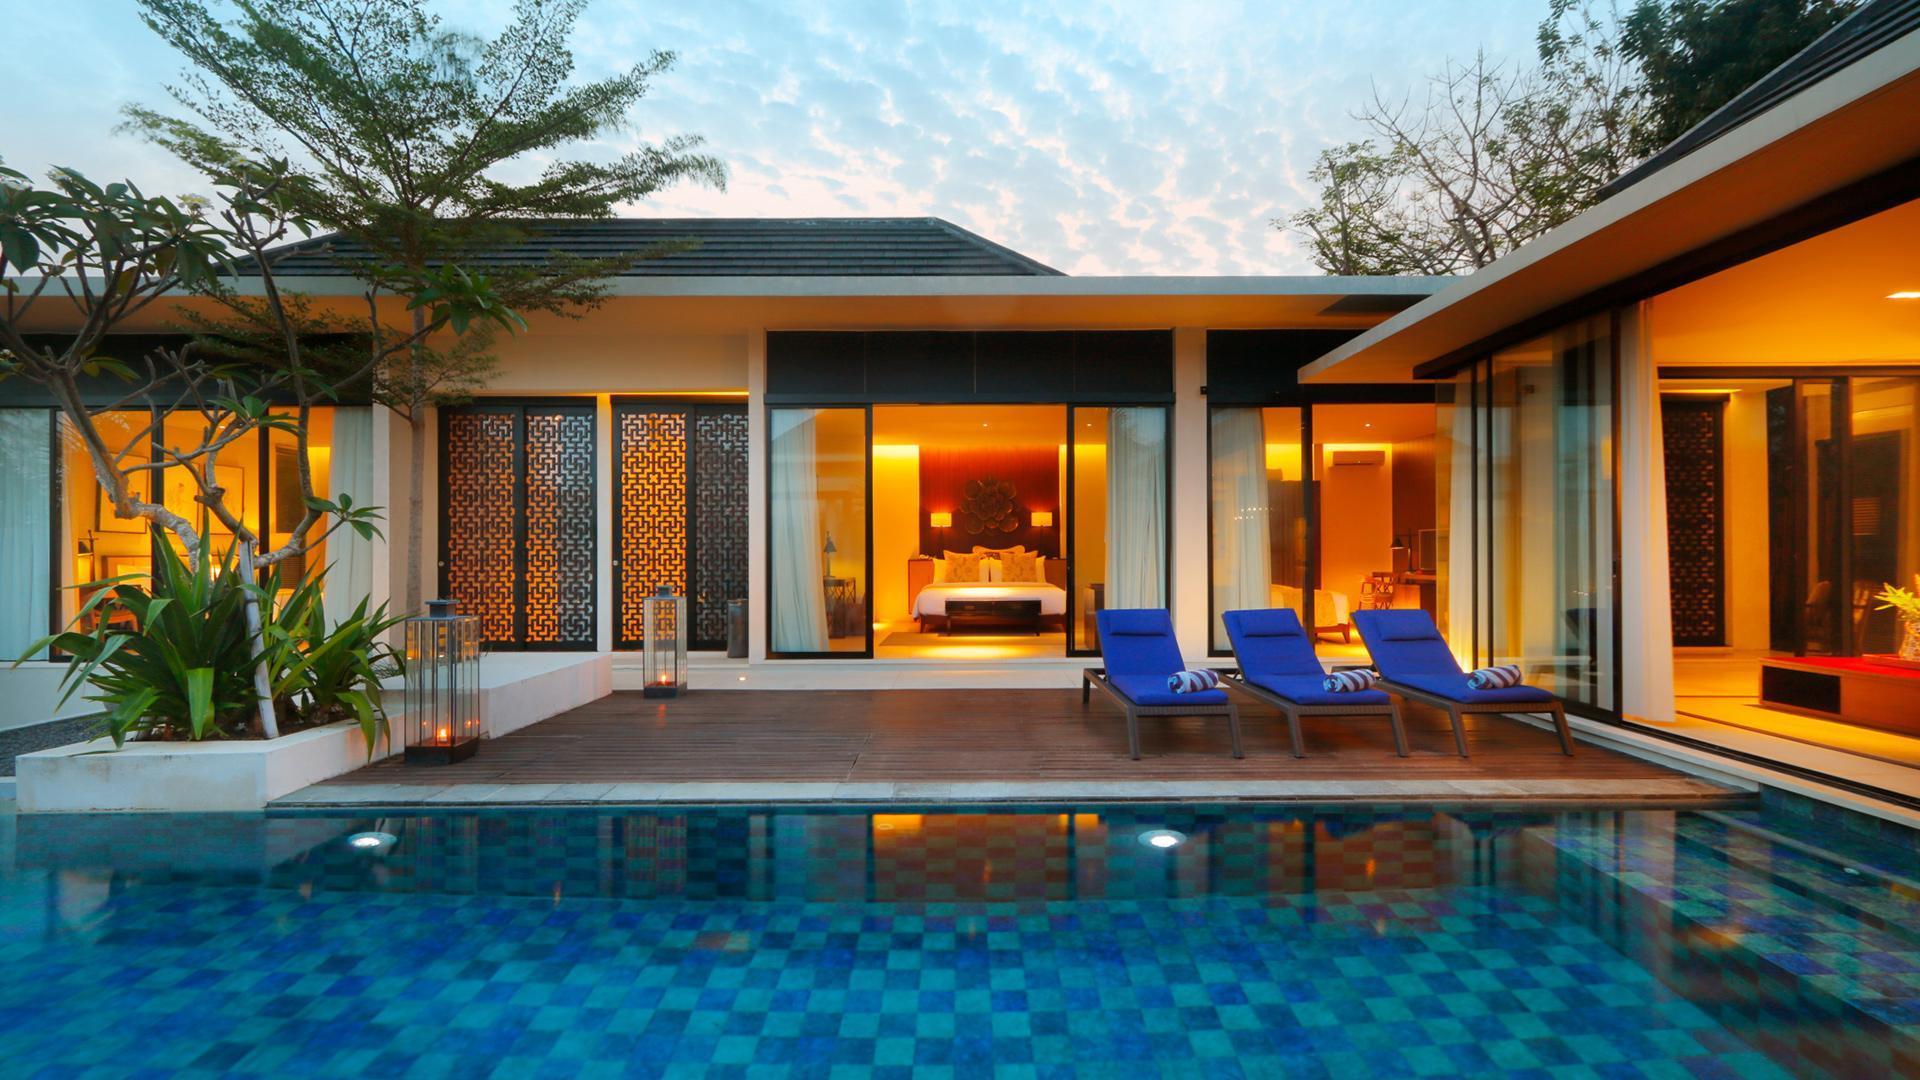 Three Bedroom Duplex Pool Villa image 1 at Vinila Villas by Kabupaten Badung, Bali, Indonesia